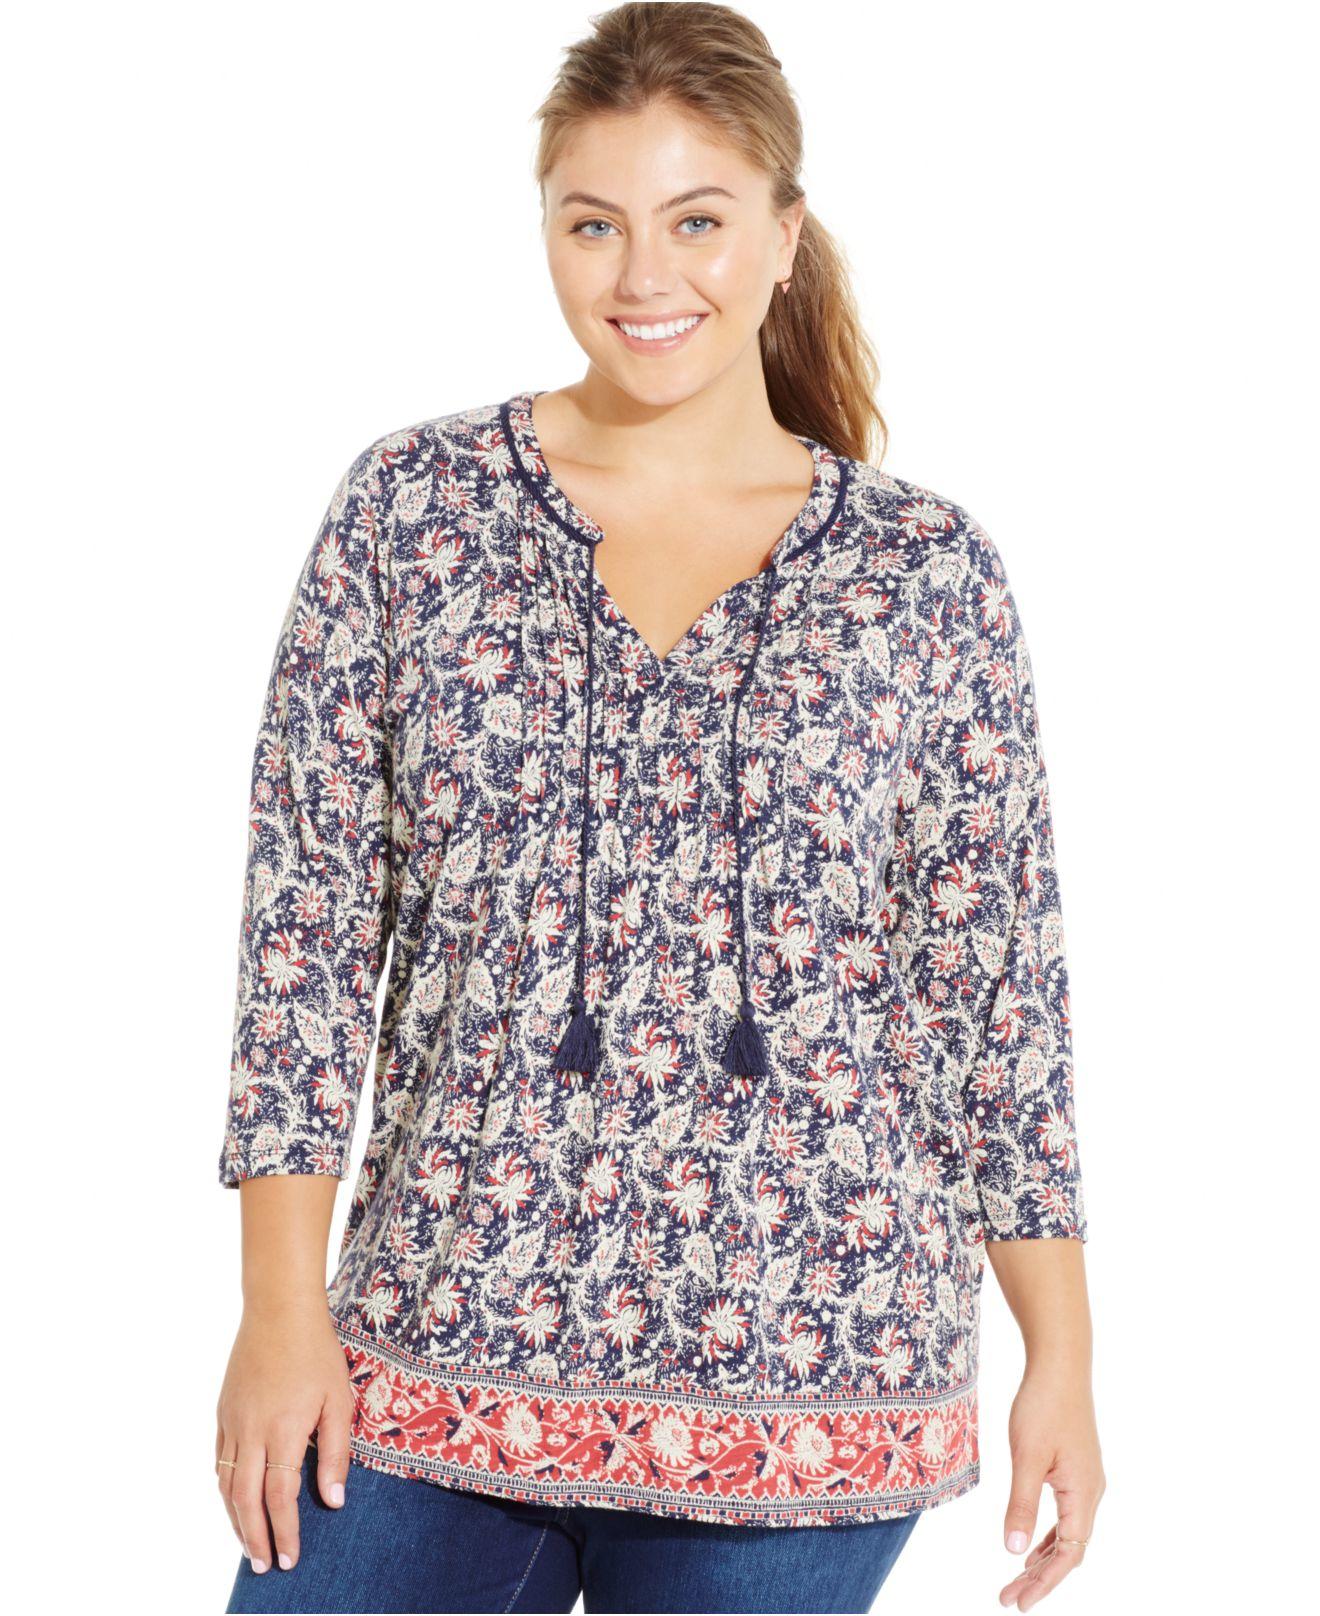 e82310f25588e9 Lyst - Lucky Brand Plus Size Border-print Floral Peasant Top